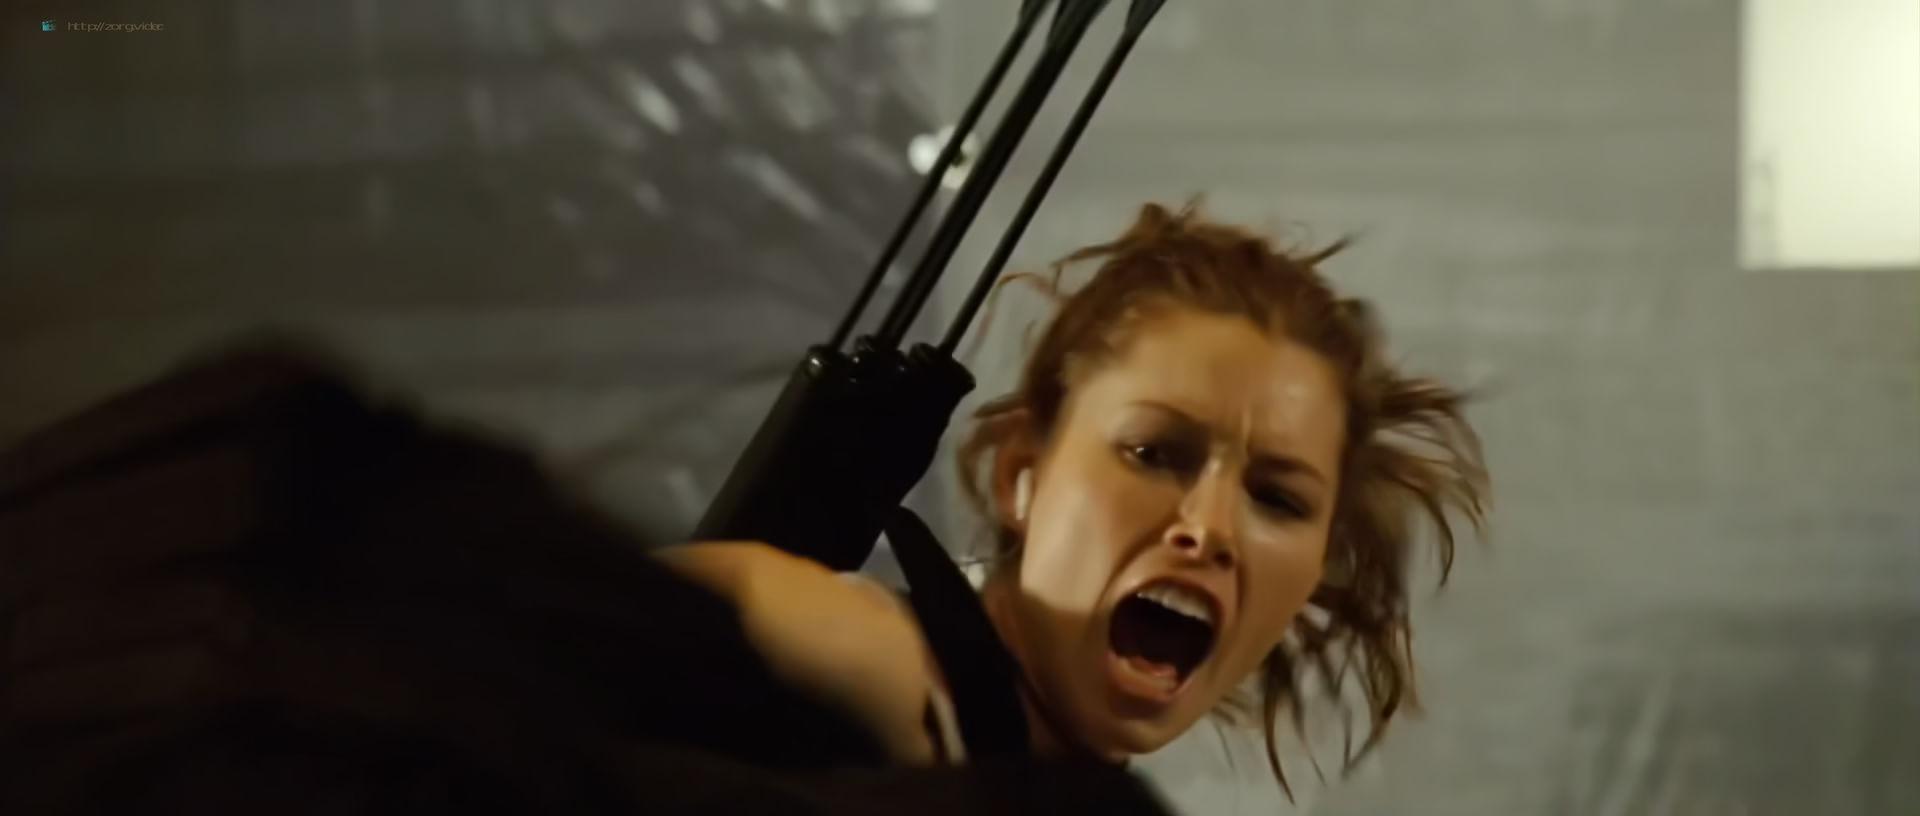 Jessica Biel hot and sexy - Blade Trinity (2004) HD 1080p BluRay (5)